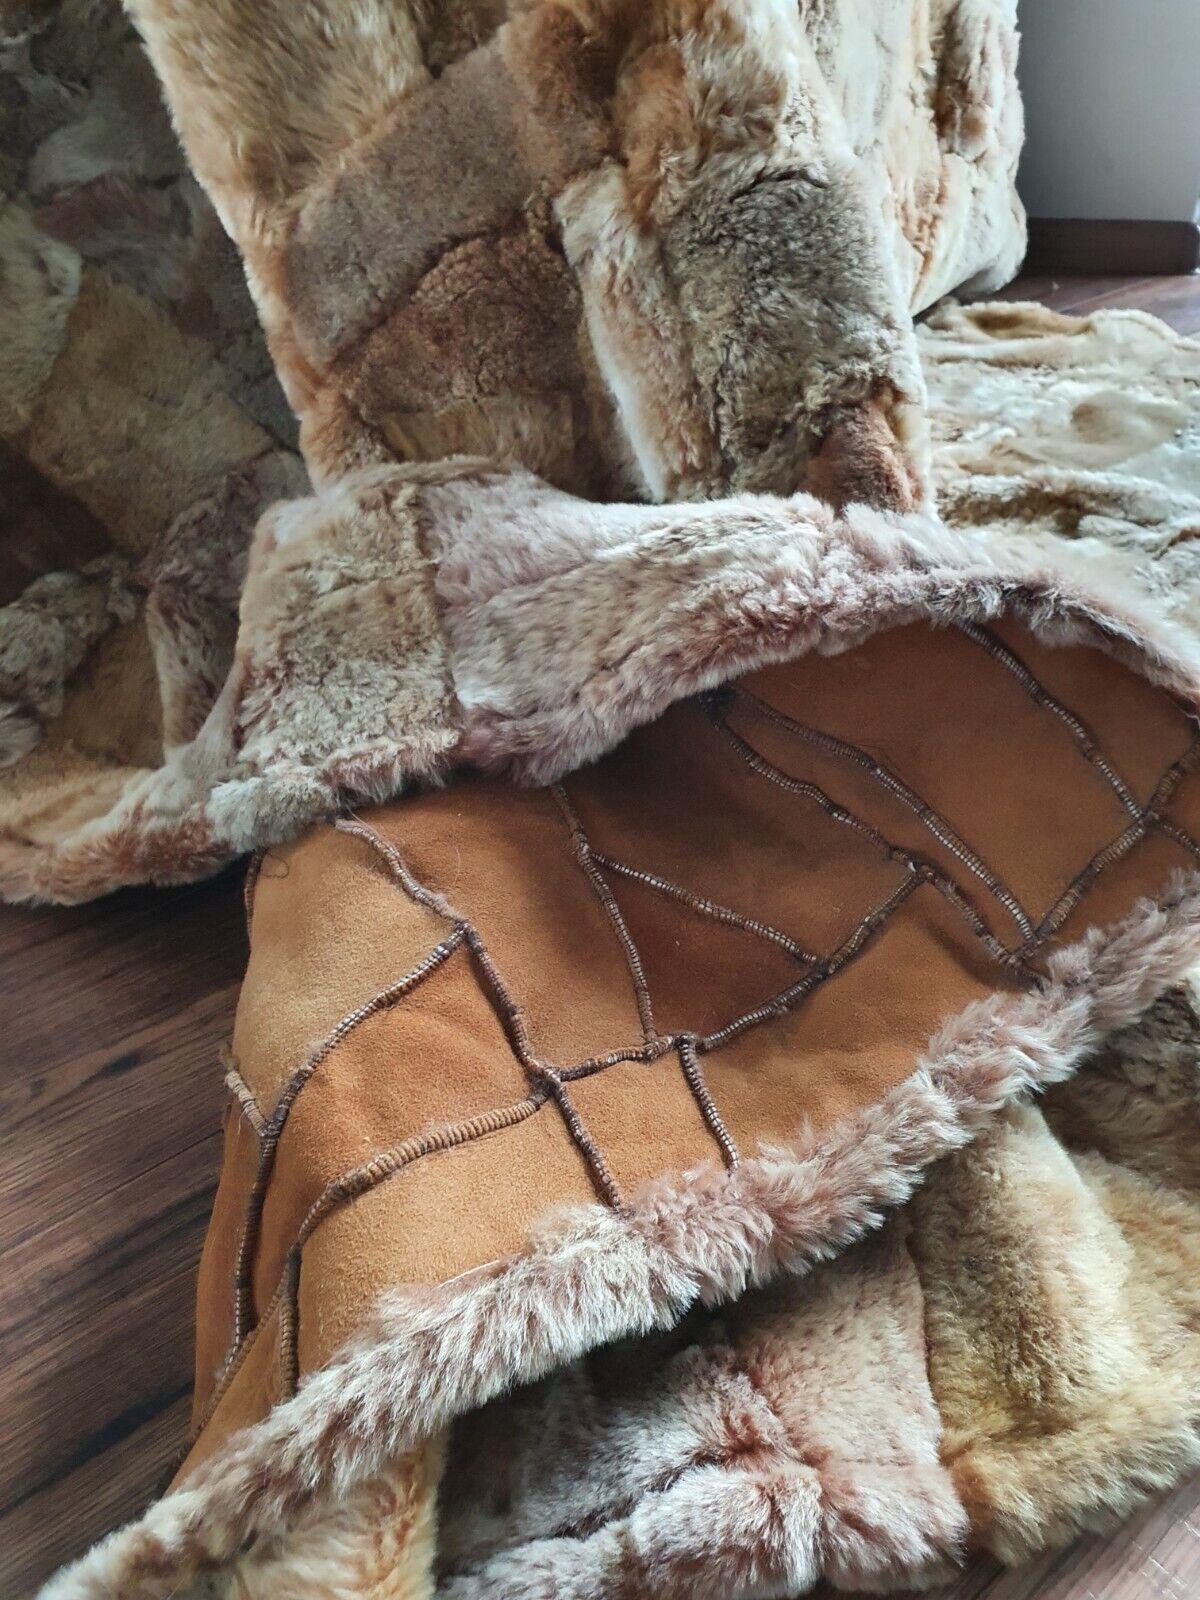 Lederteppich Toscana Lammfelldecke Stone Patchwork Rückseite 160/200 cm Karamel